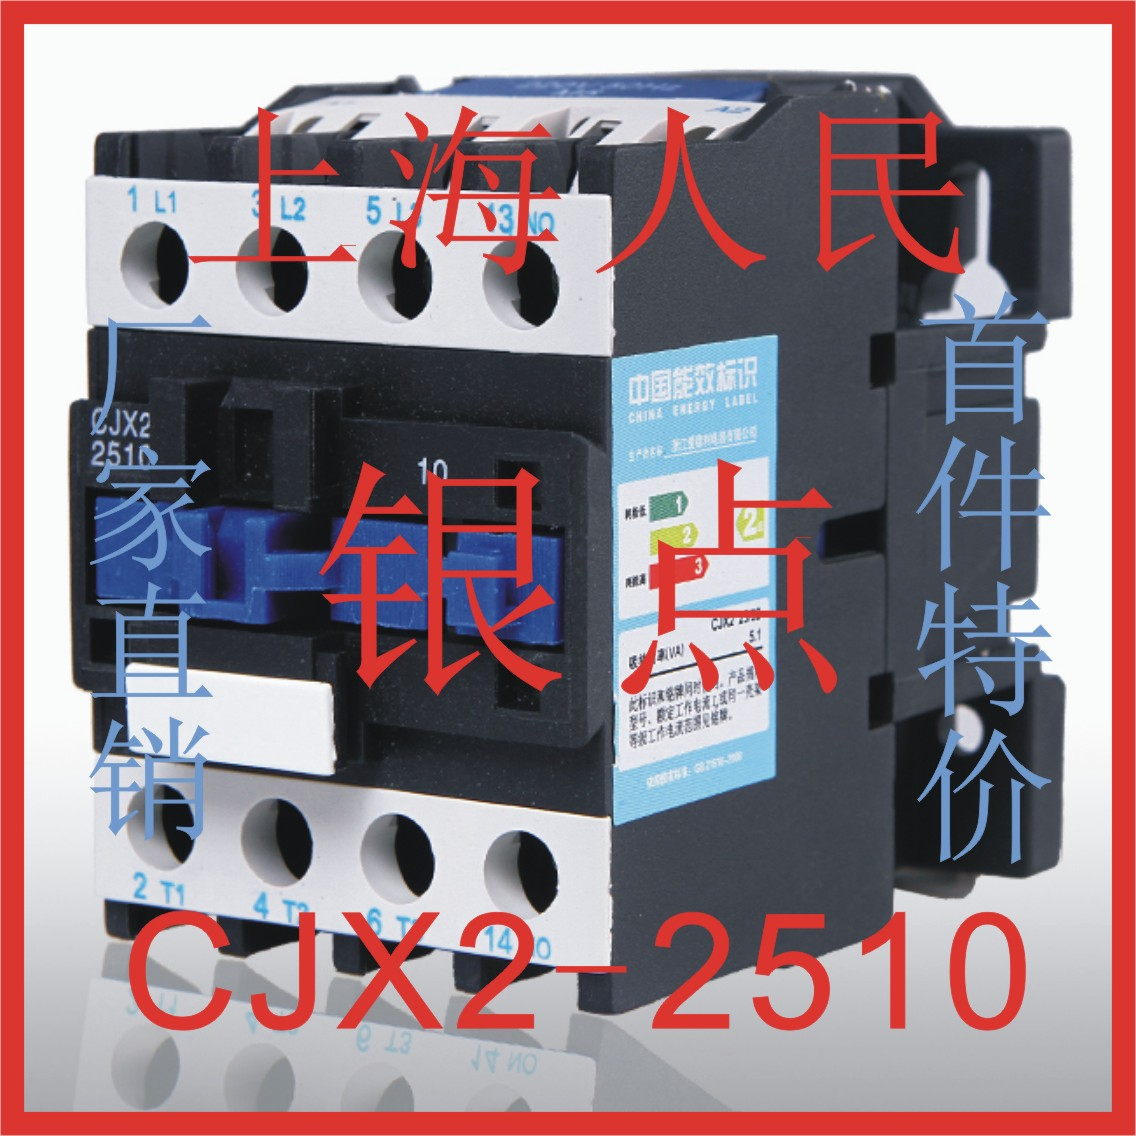 德力西交流接触器25A CJX2-2510 2501 LC1 CJX4 220V 380V110V36V